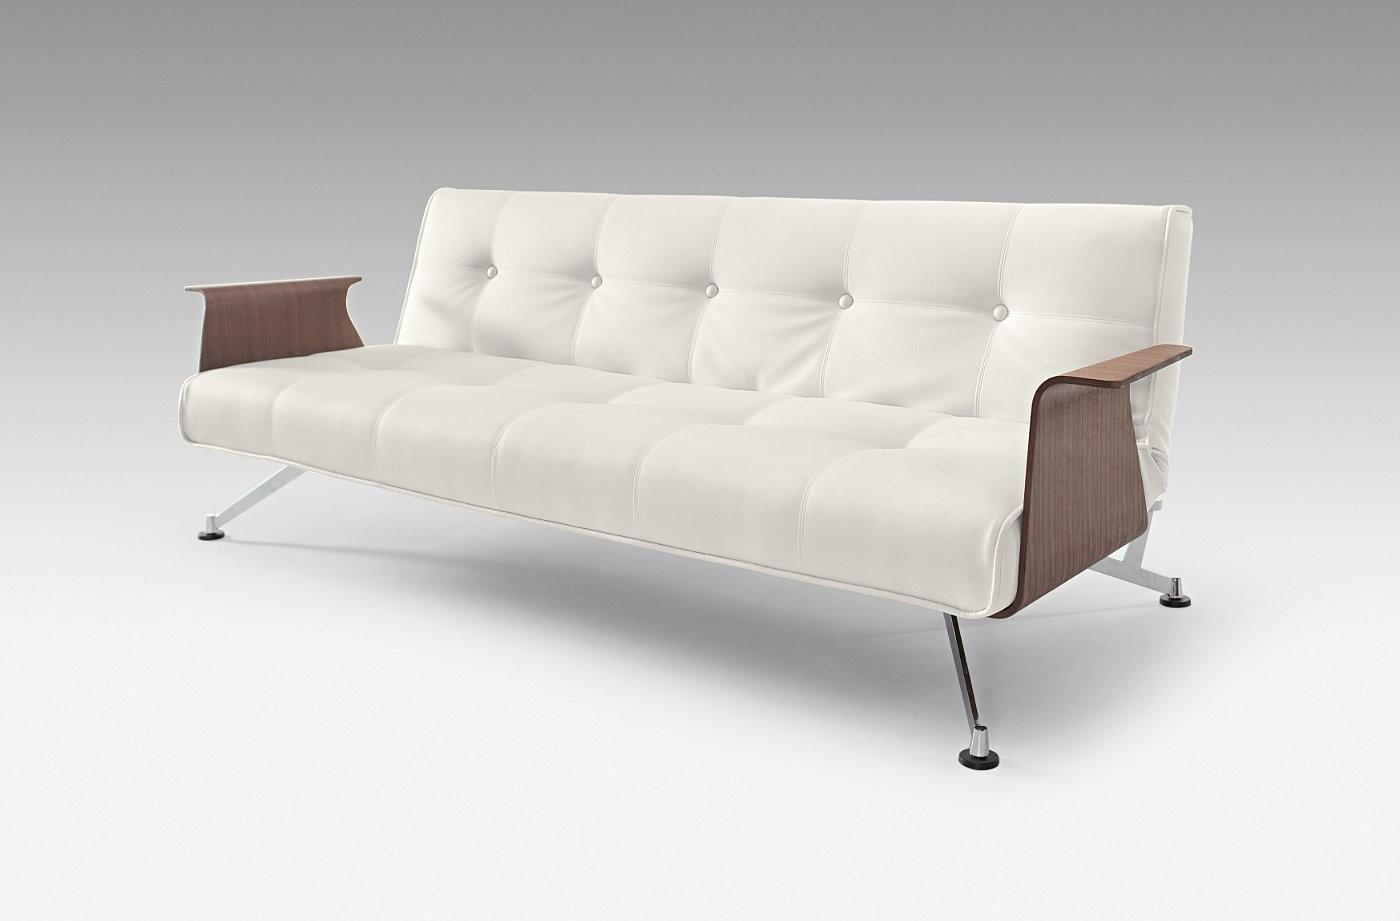 innovation-slaapbank-sofa-clubber-wit